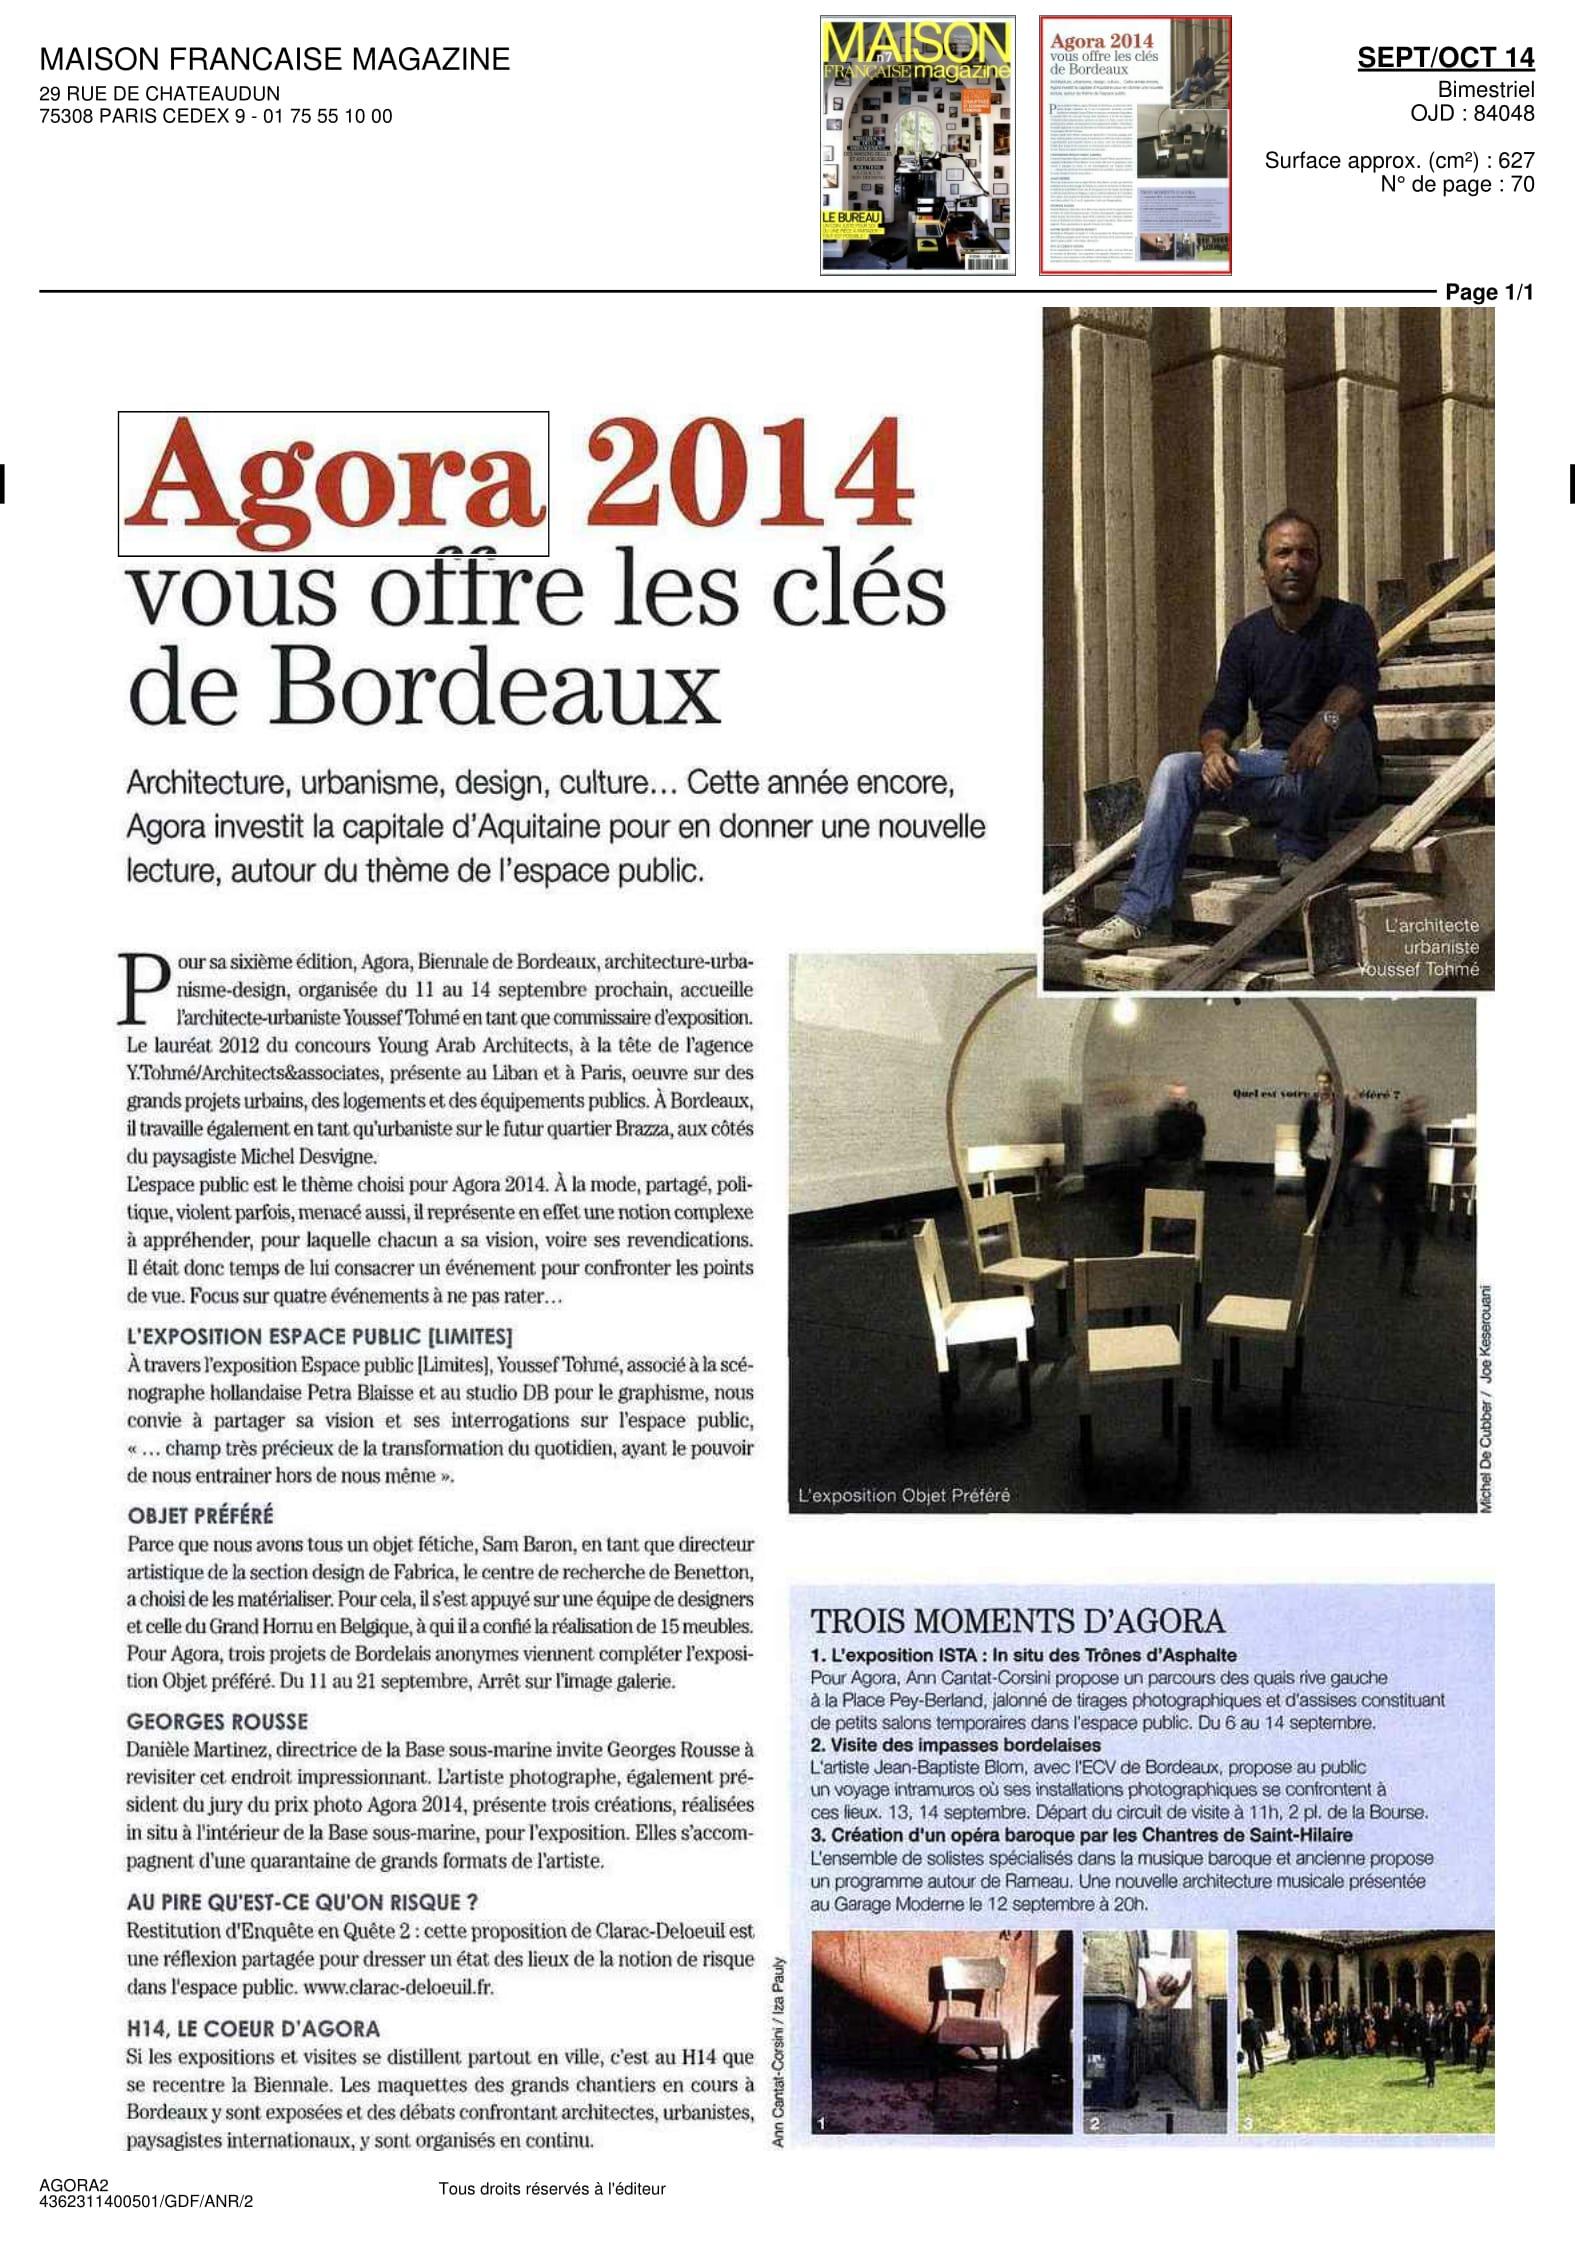 Ytaa maison fran aise magazine for Maison magazine